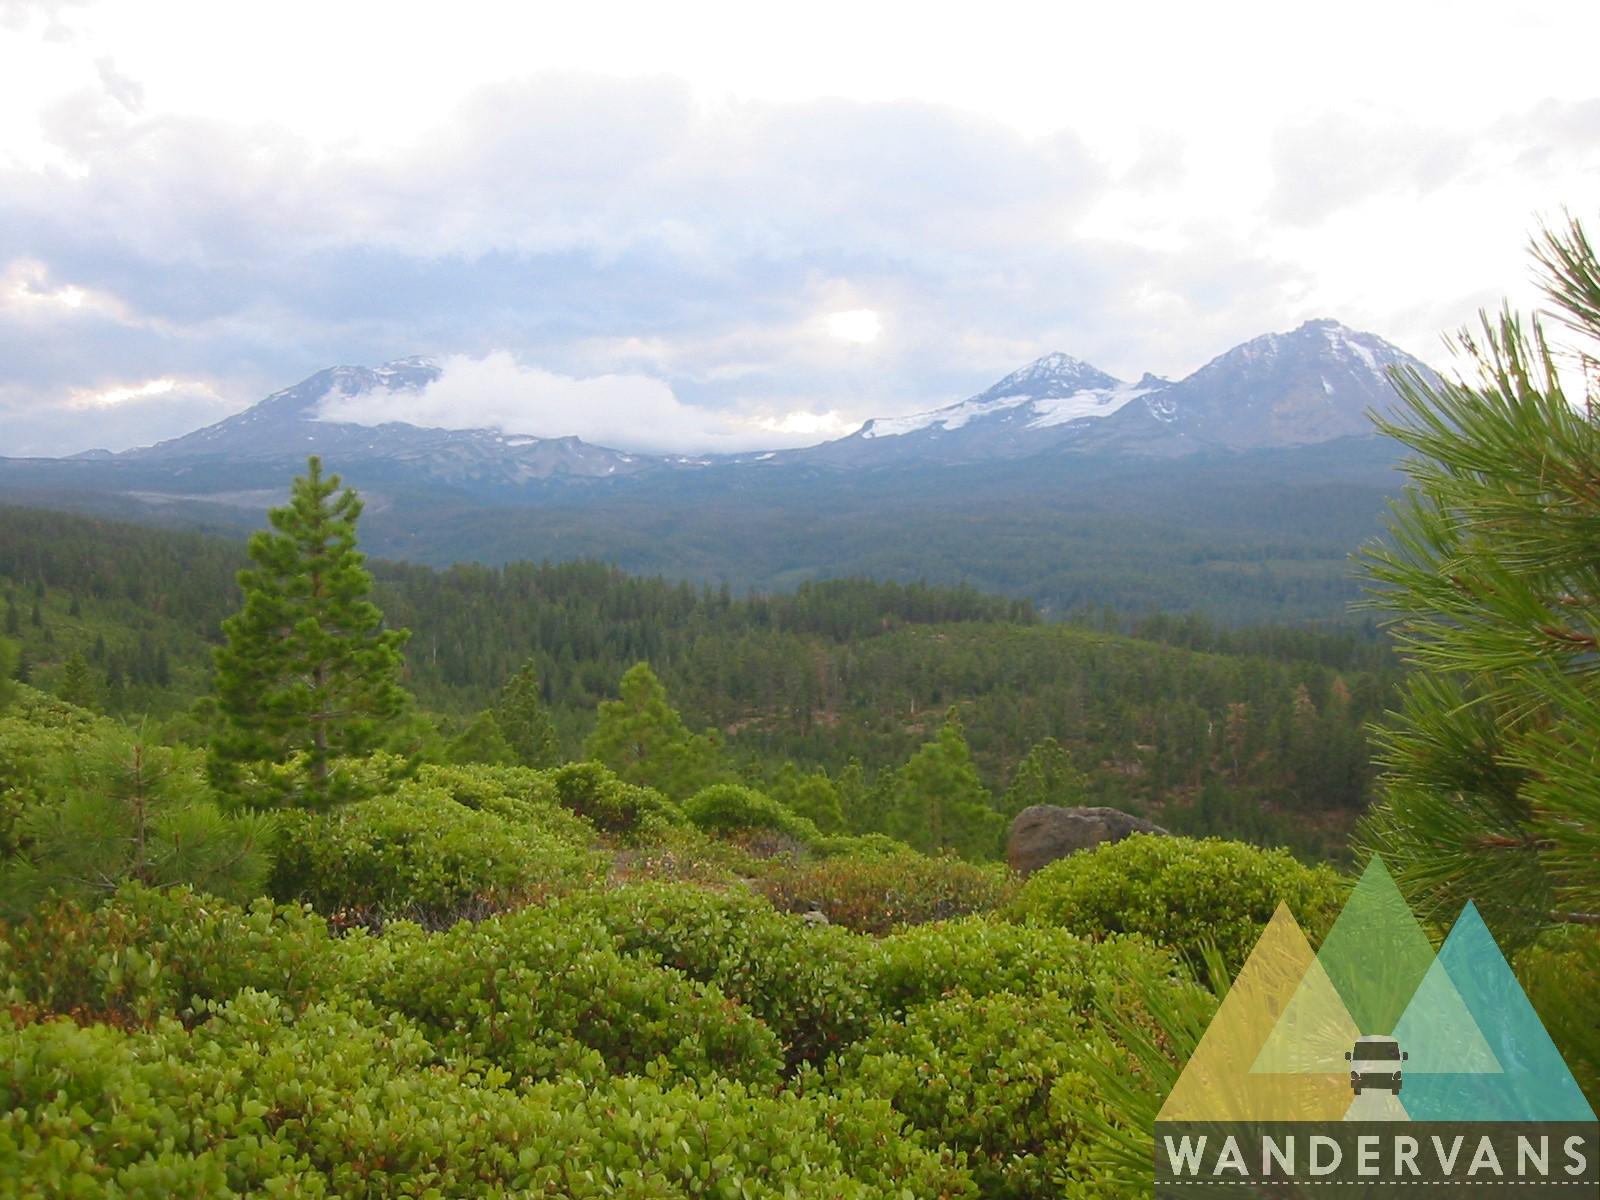 vanlife-rv-campervan-rent-idaho-sun-valley-boise-wandervans-wanderlust-skiing-backcountry-snowboard-sawtooth-biking-hiking-outsidevan-bend-oregon